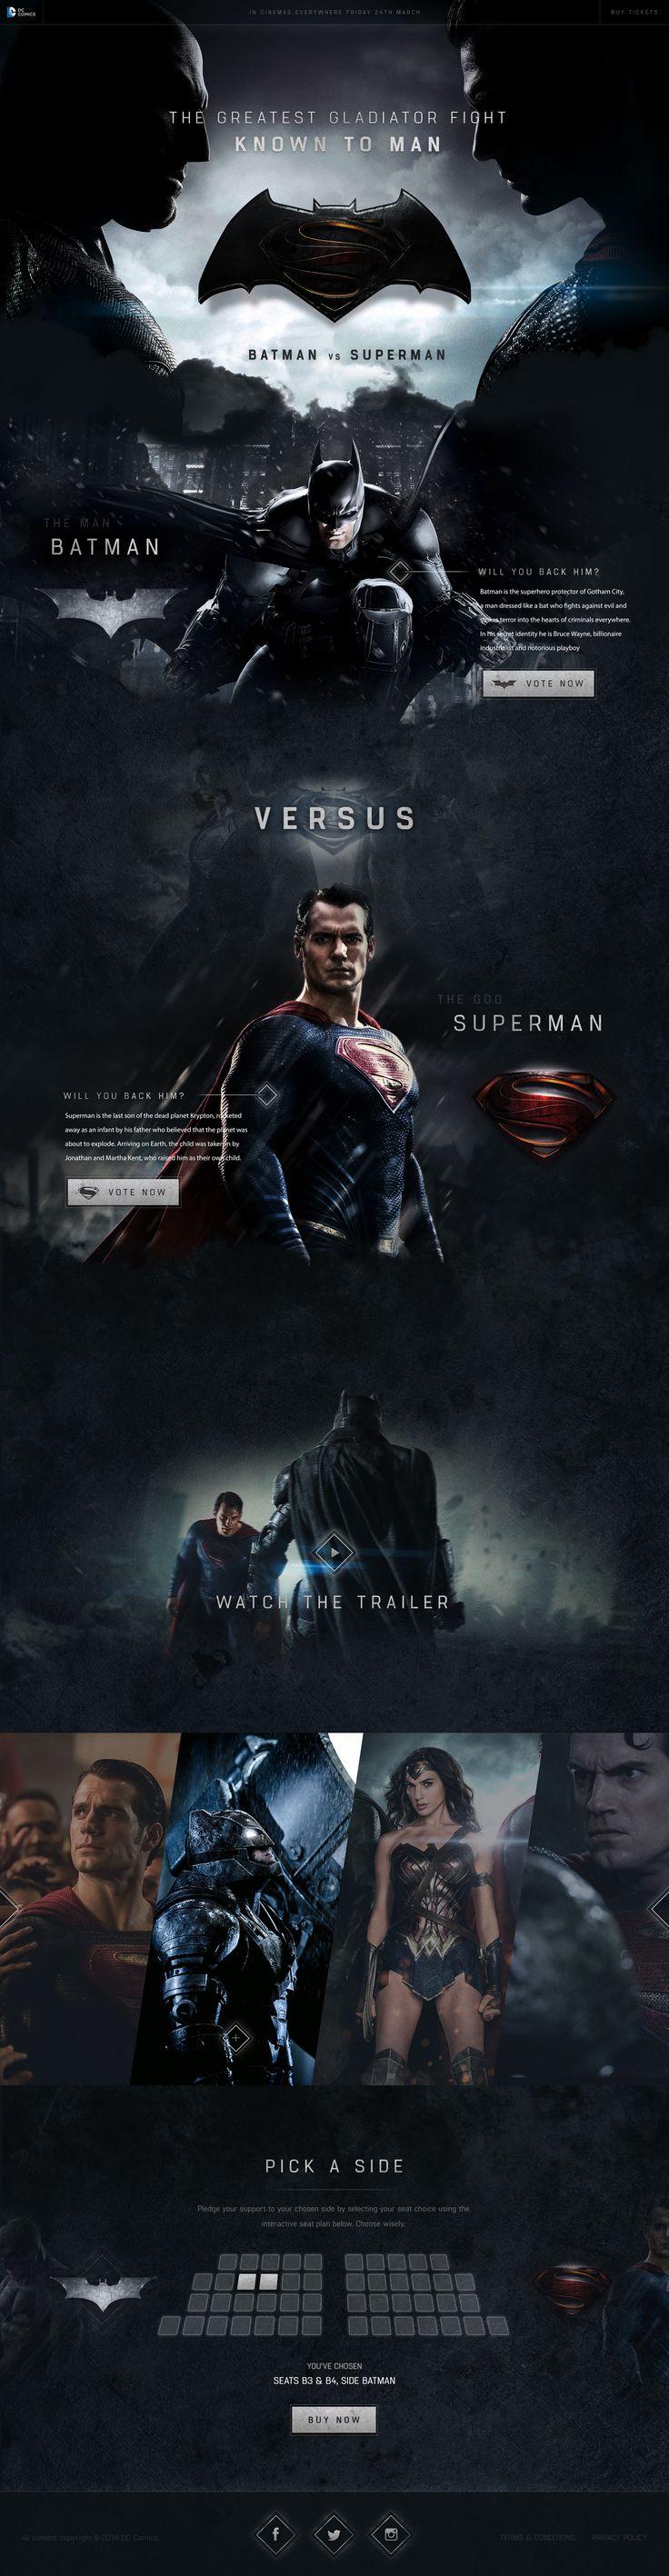 Batman vs Superman Website Concept by Green Chameleon